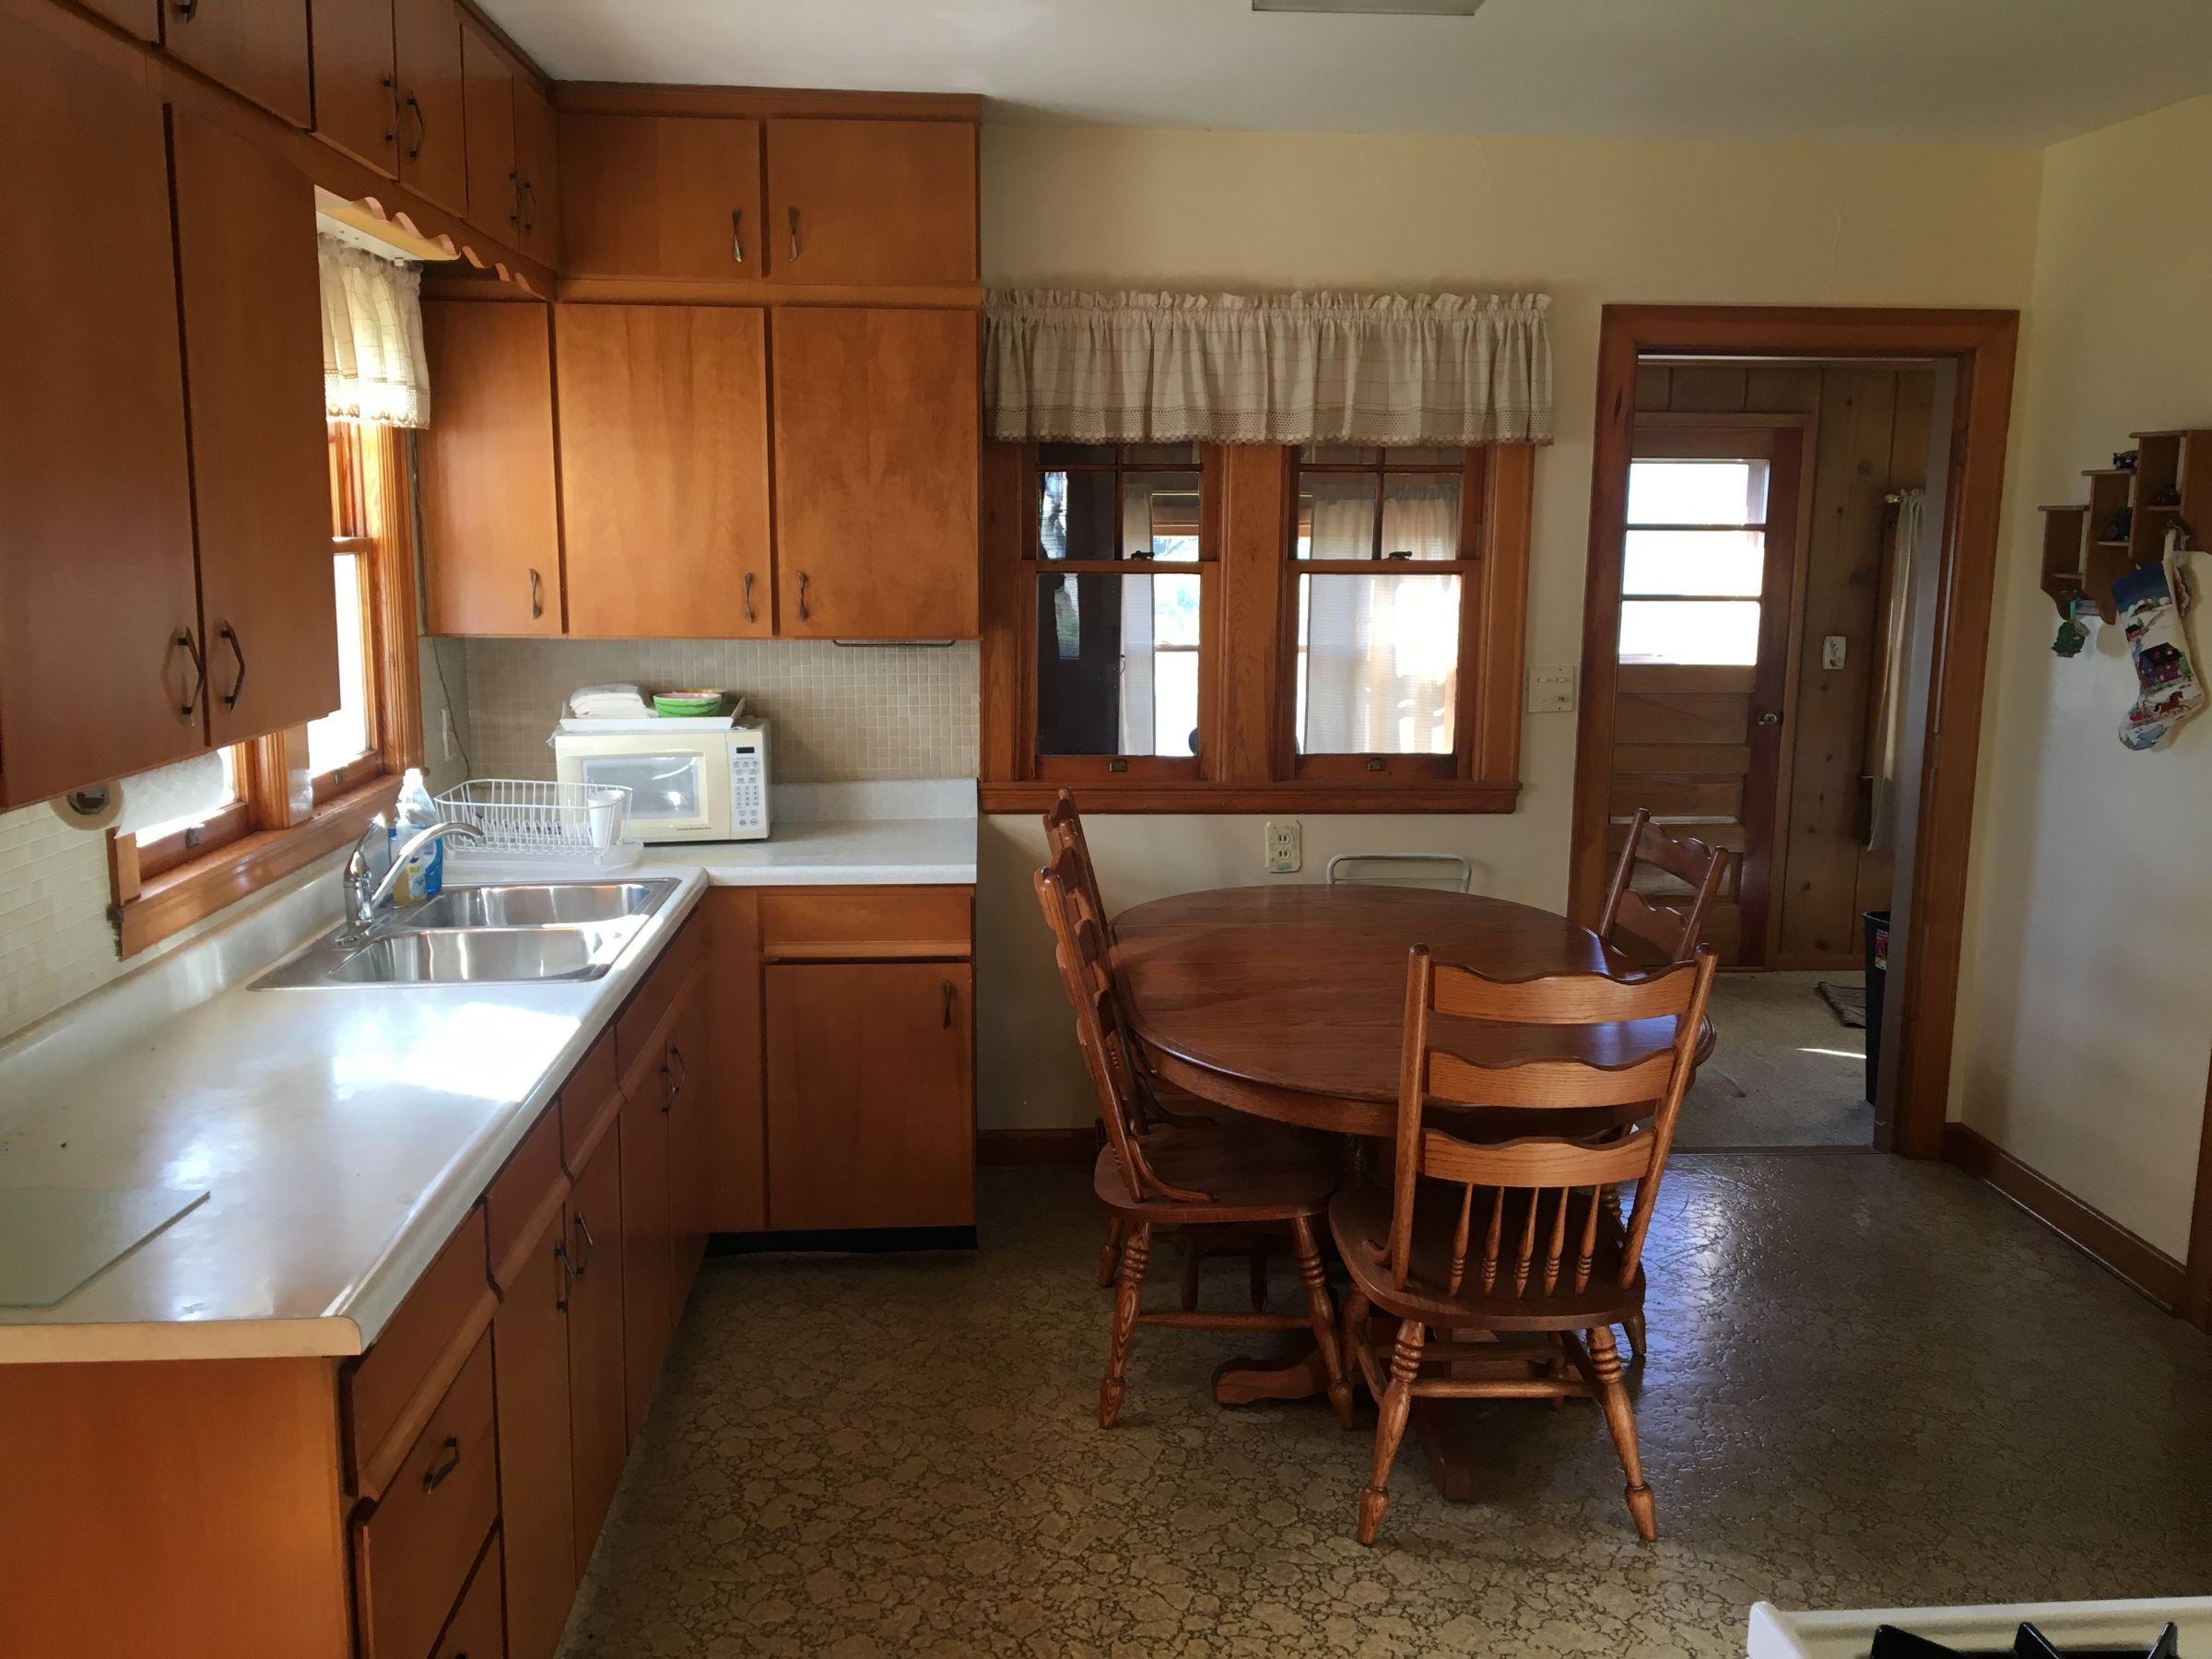 Peoples Company Land for sale Warren County Iowa-14317 210th Ave. Milo, IA 50166.jpg